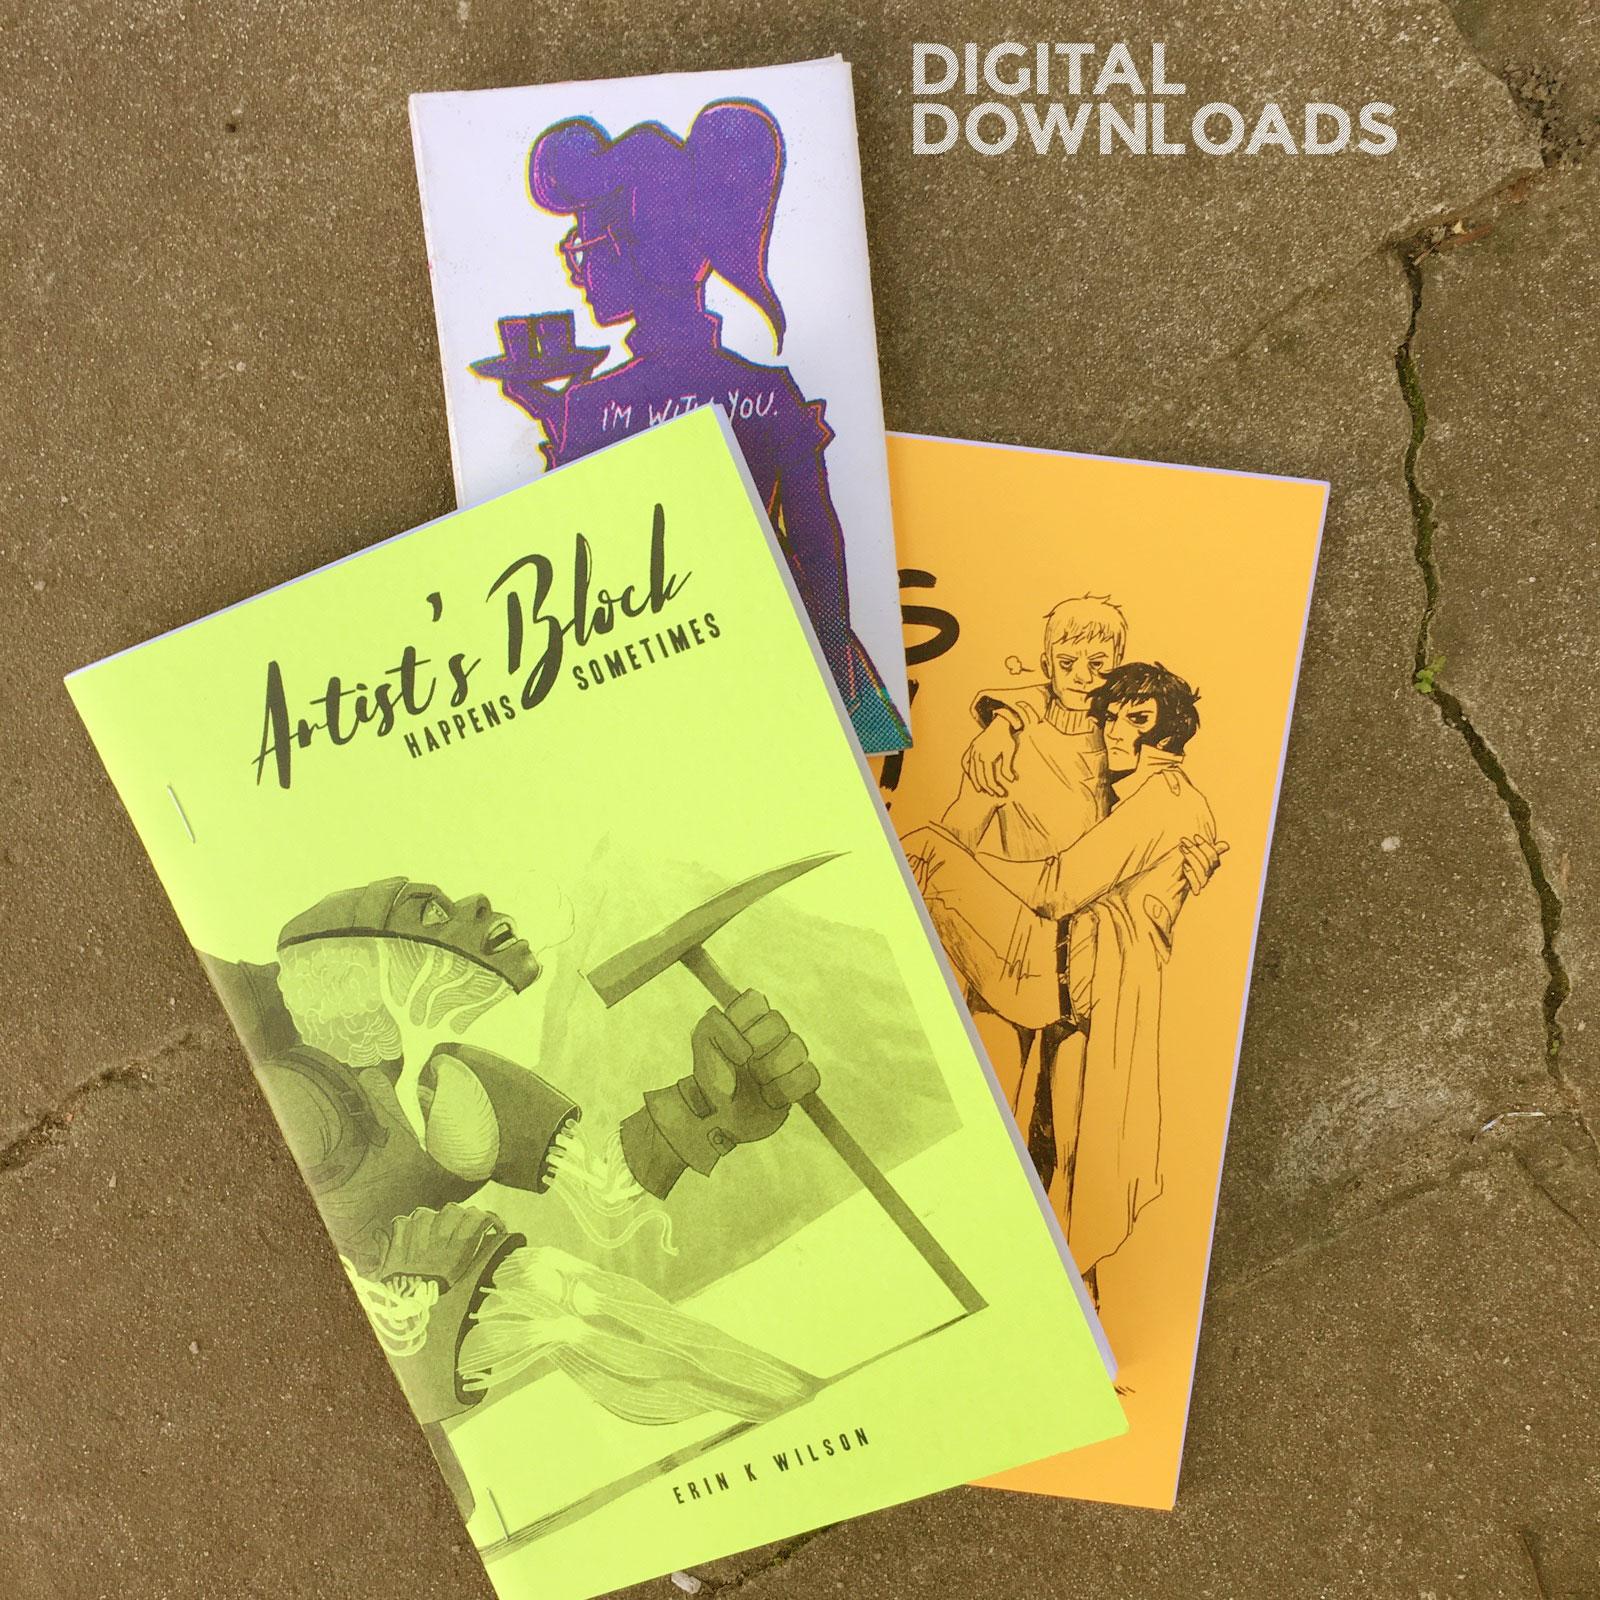 digital-downloads.jpg